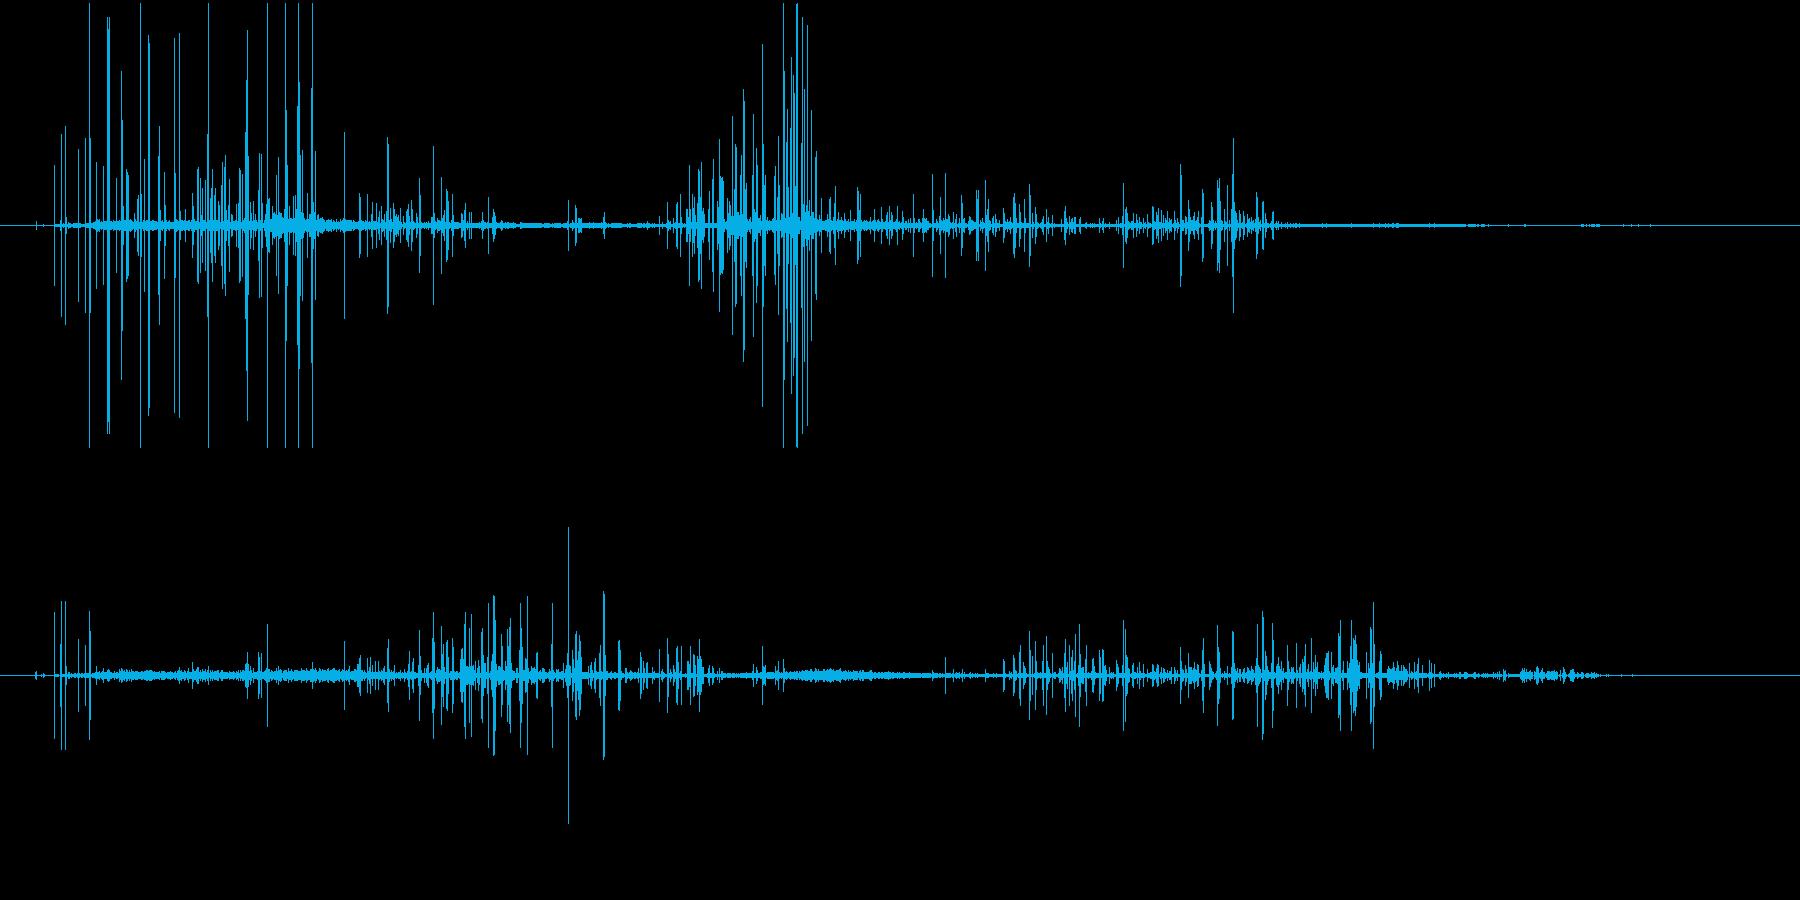 【SE 効果音】ノイズの再生済みの波形